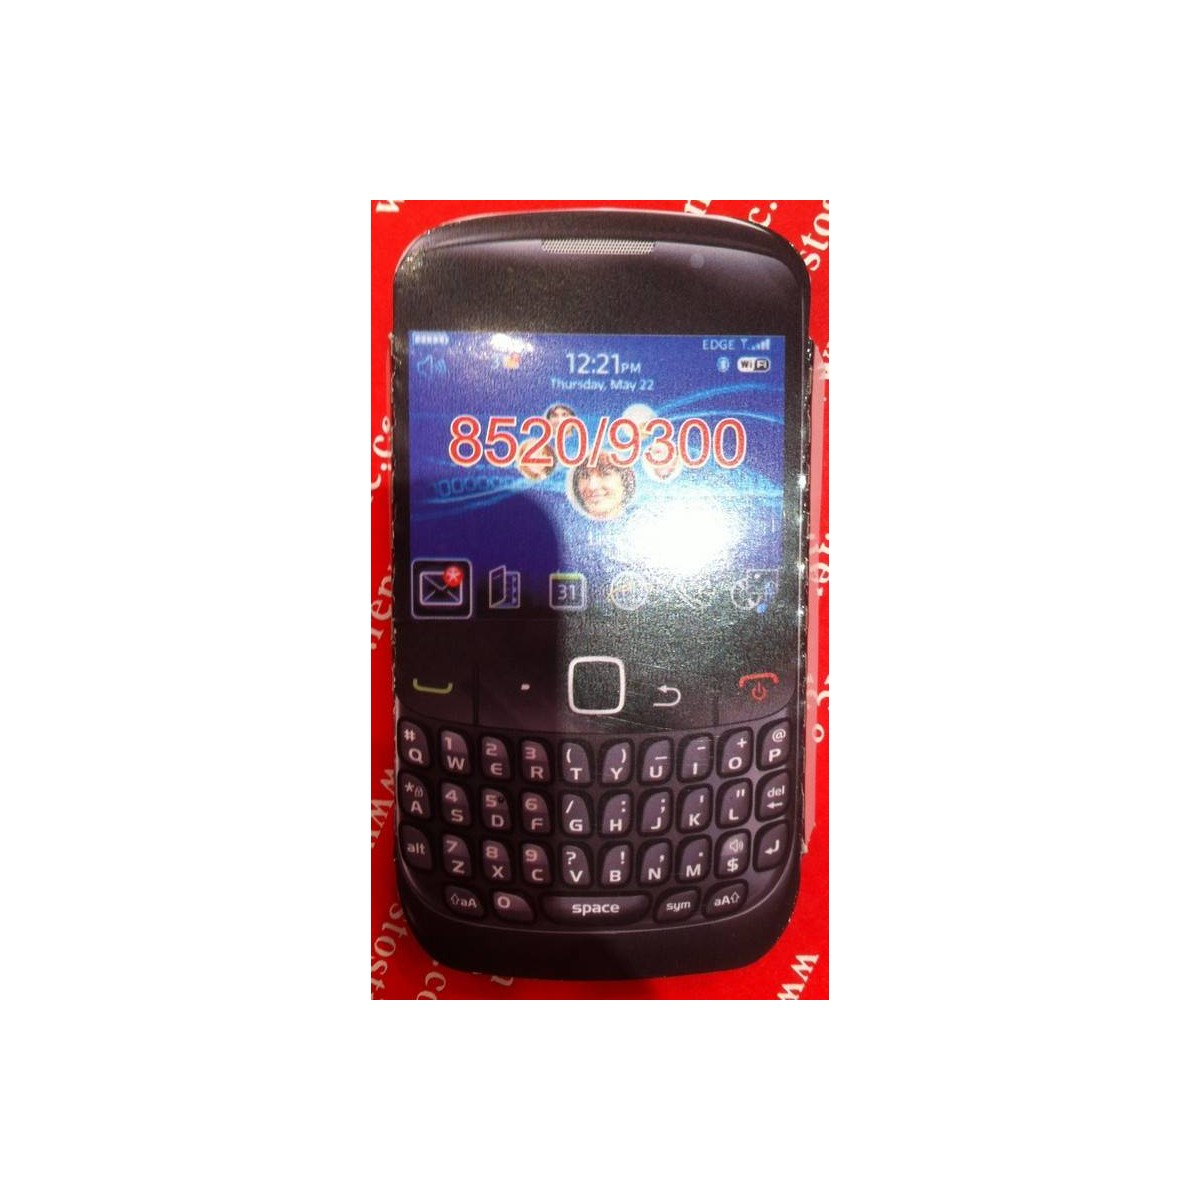 Funda Silicona BlackBerry 8520/9300 VERDE